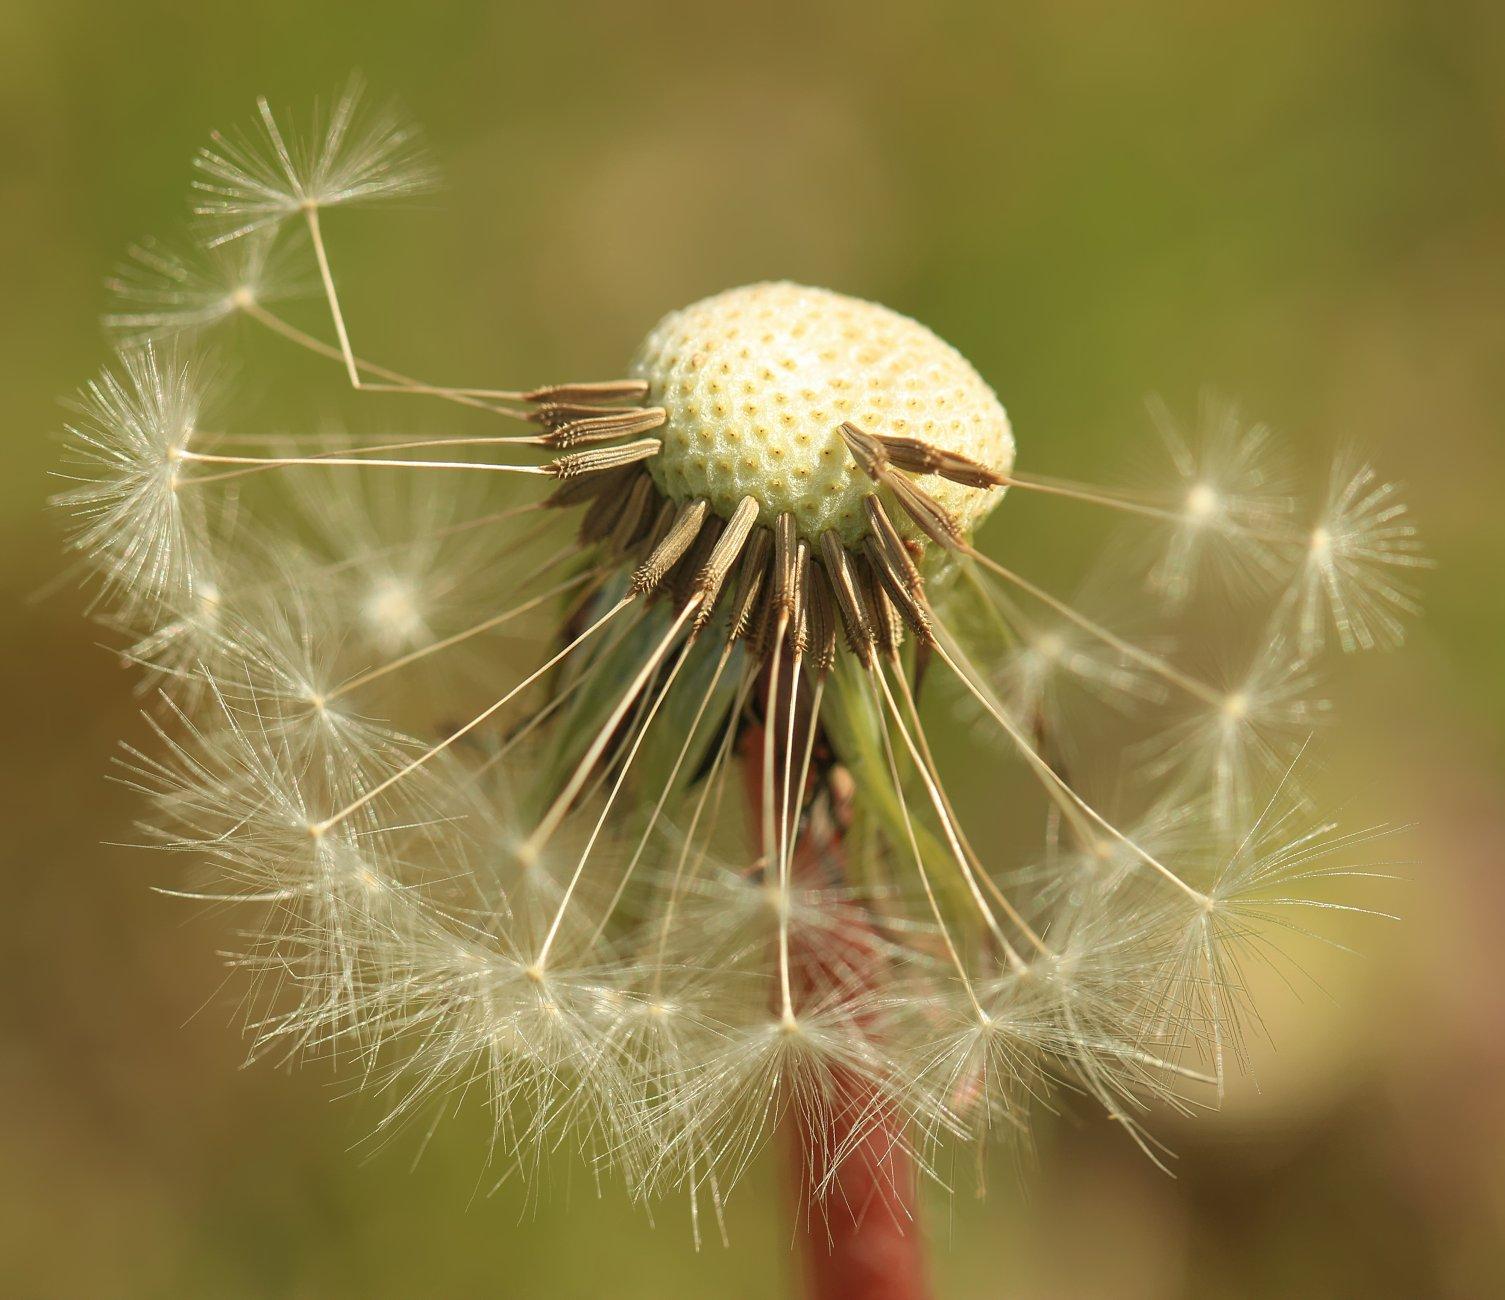 Dandelions - Macro shots